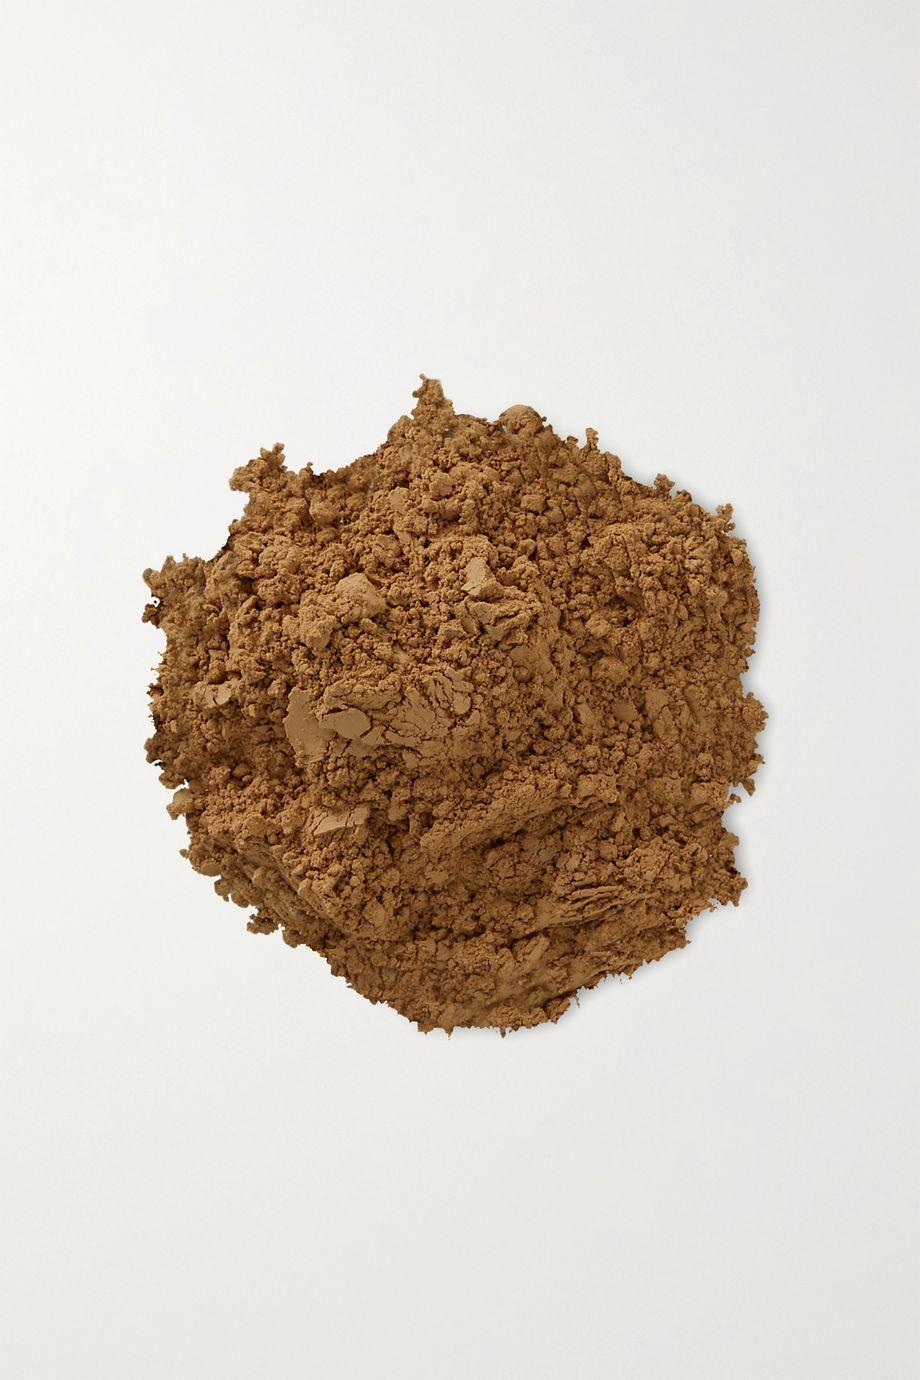 BY TERRY Hyaluronic Tinted Hydra-Powder - Medium Dark No. 500